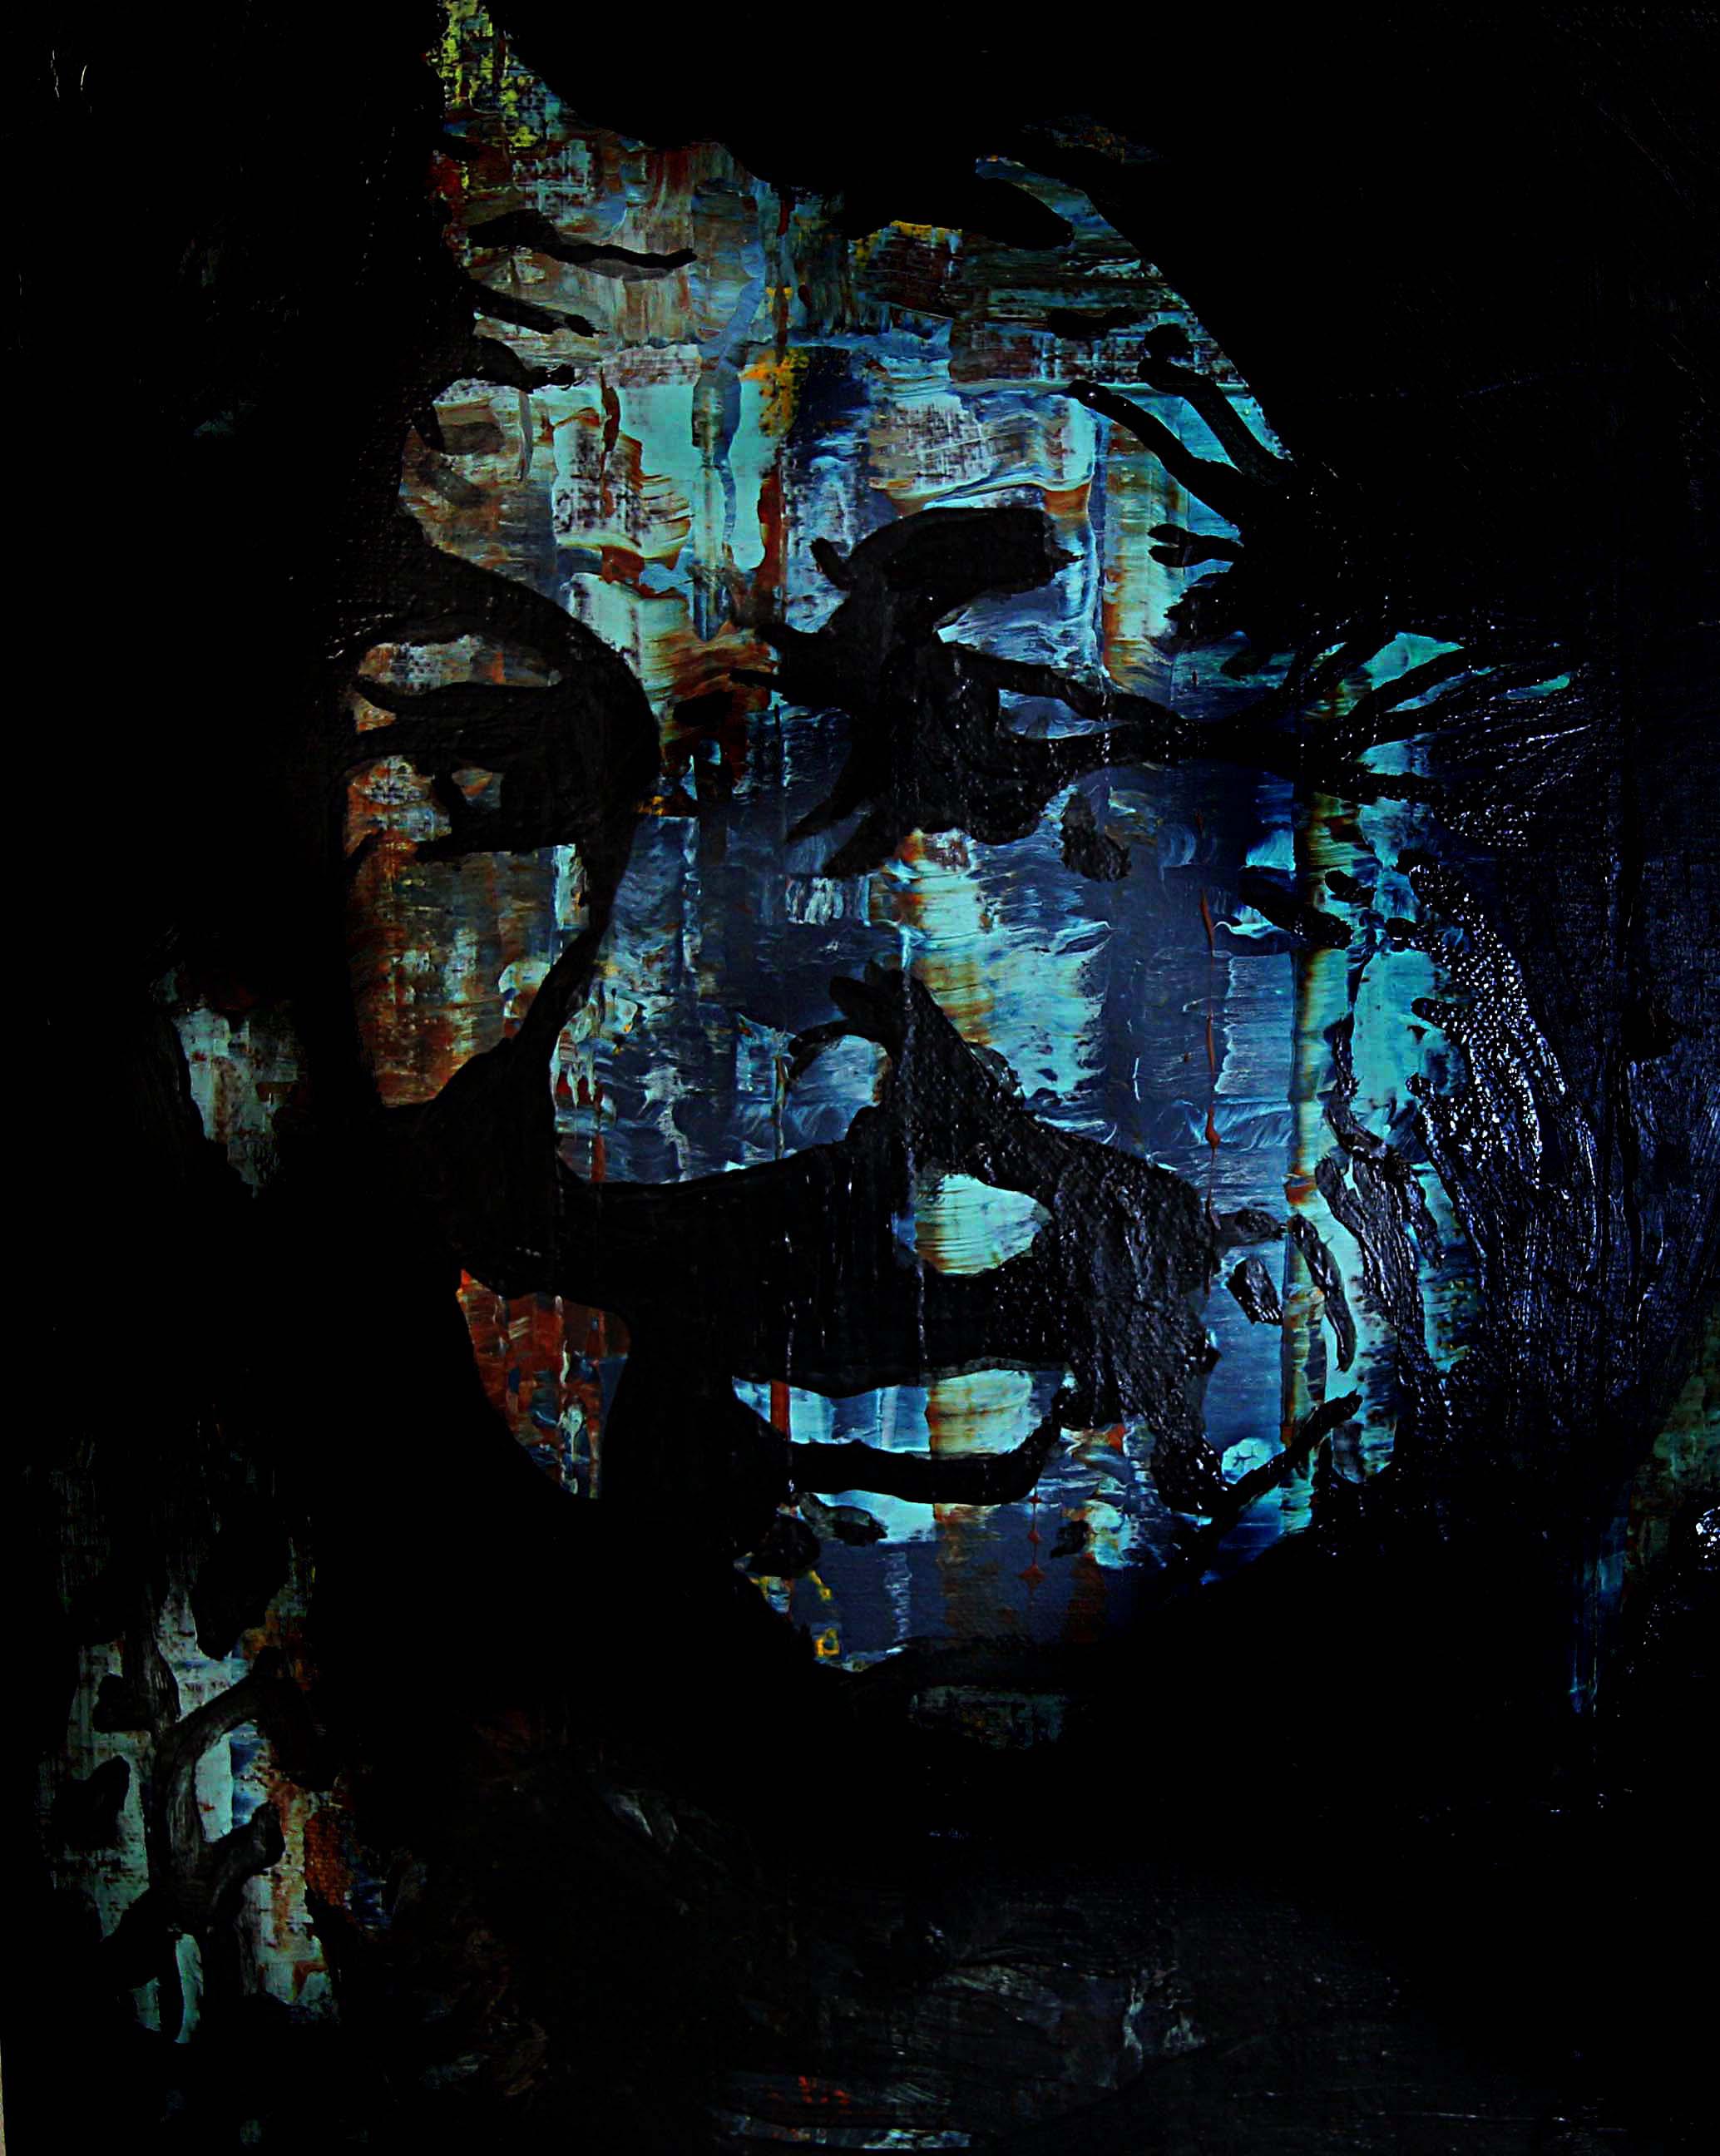 Old Soul 2018 | Acrylic on canvas | 40 x 30 cm | £220